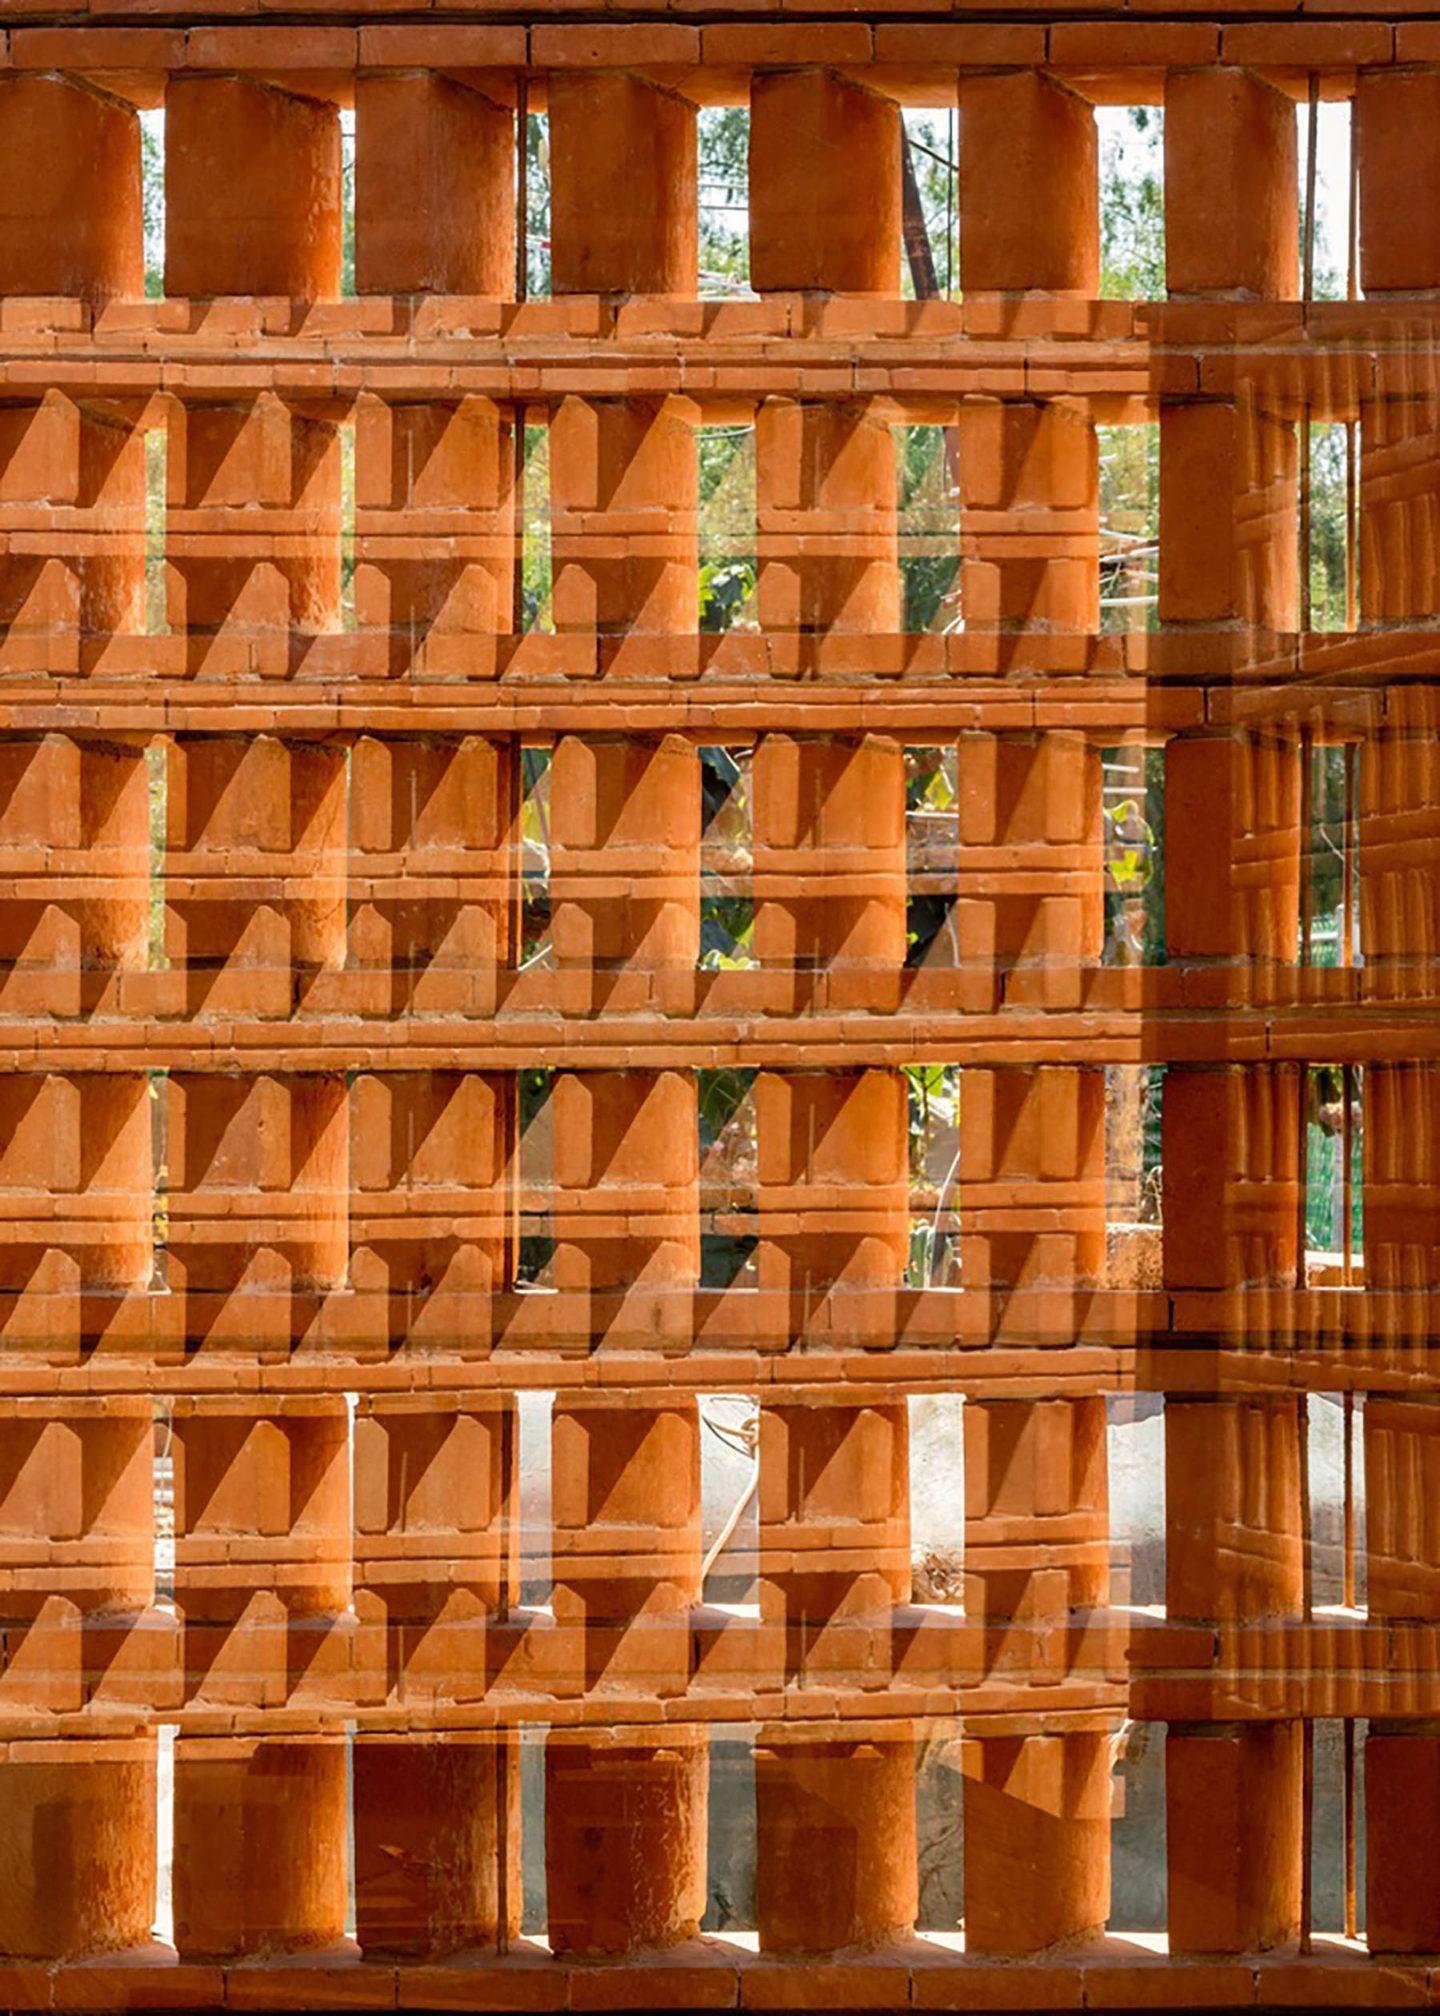 IGNANT-Architecture-Taller-De-Arquitectura-Mauricio-Rocha-Gabriela-Carrillo-Iturbide-Studio-7